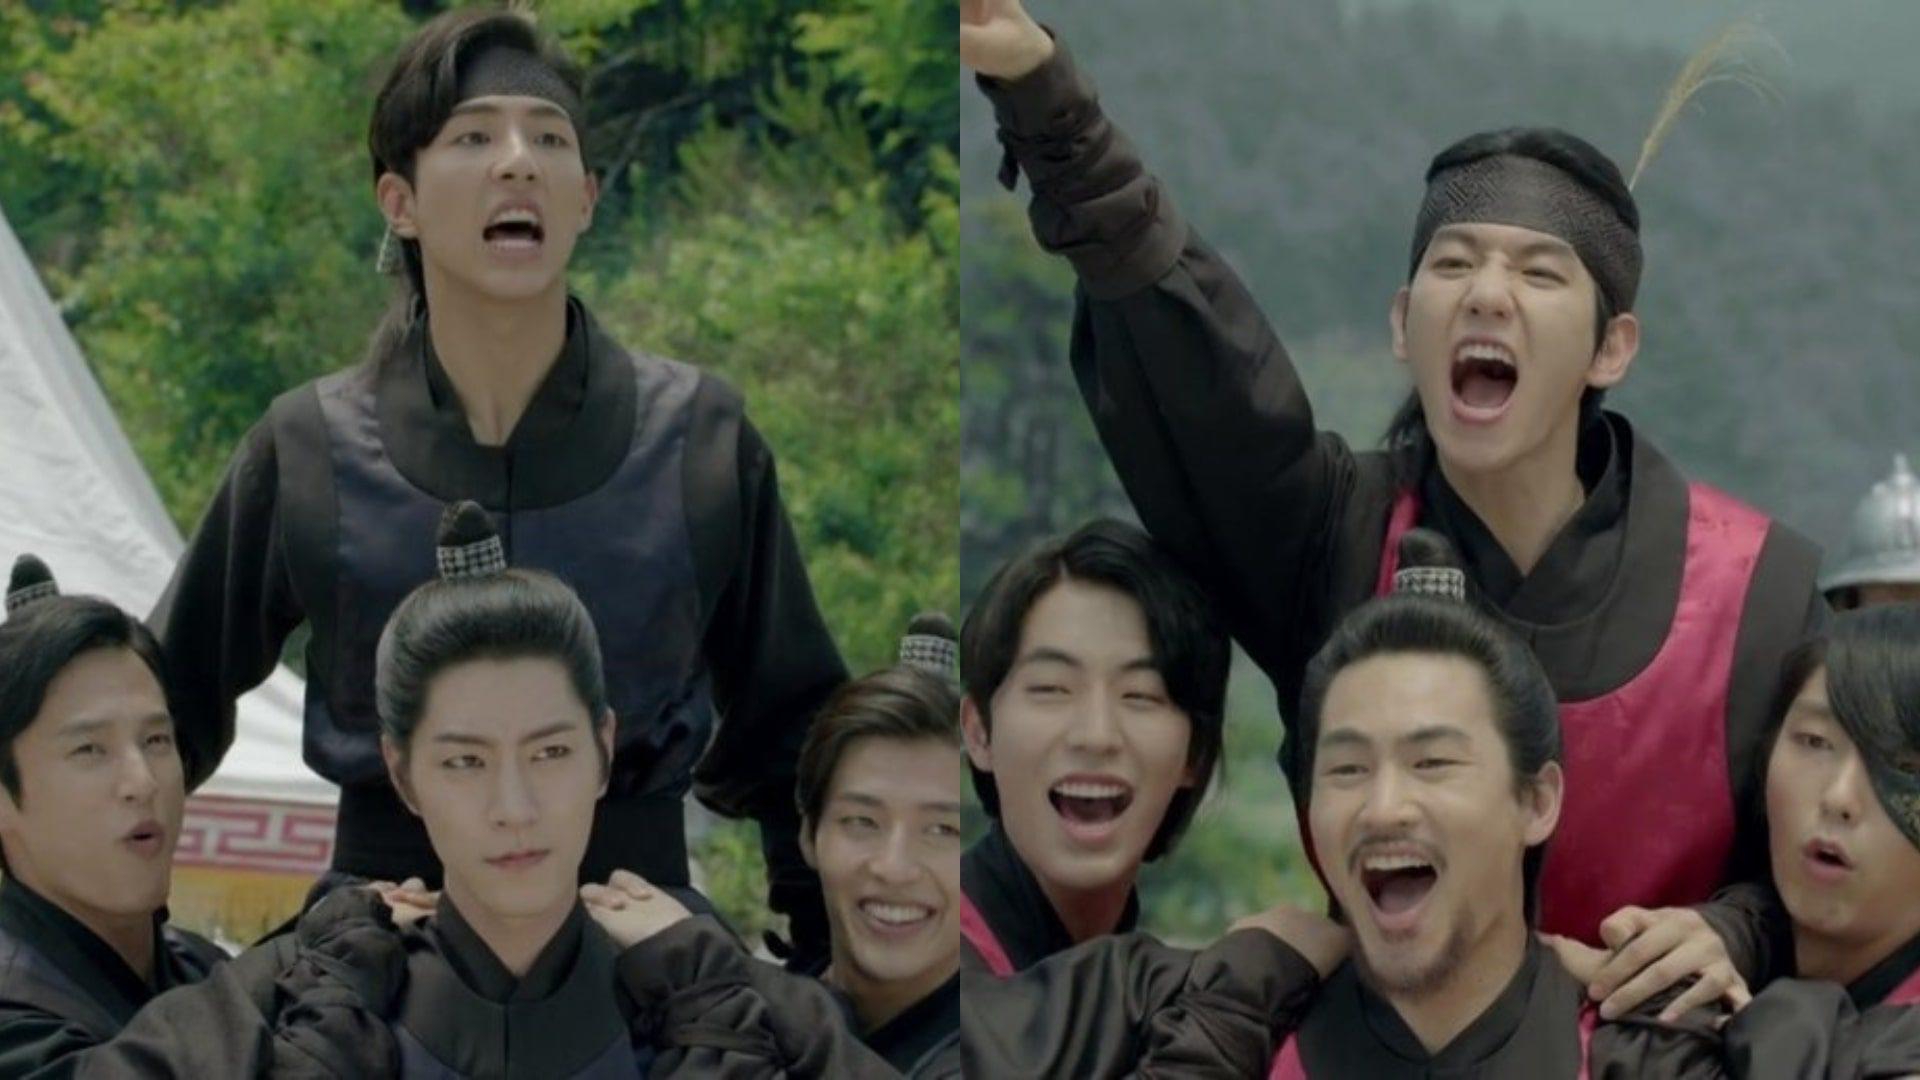 Moon Lovers Scarlet Heart Ryeo Season 2 Release Date IU & Lee Joon Gi's Romantic Sequel Coming